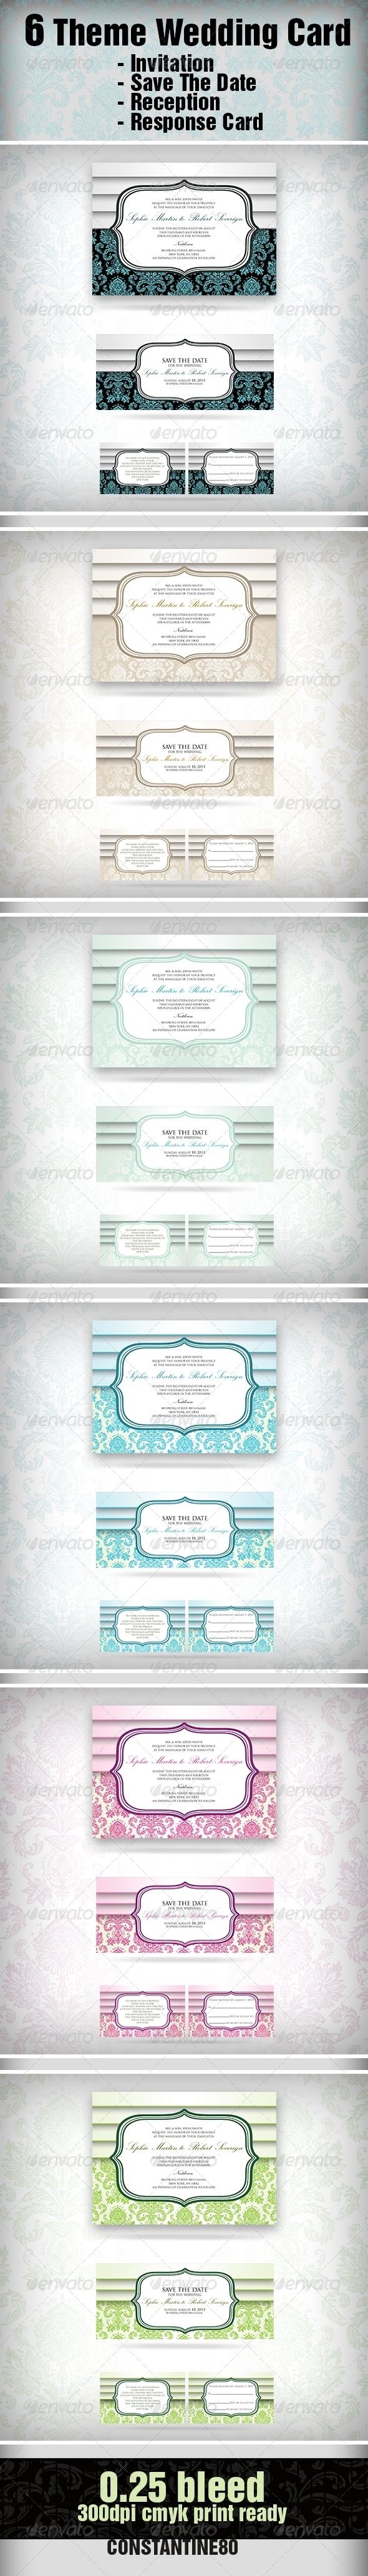 GraphicRiver 6 Theme Wedding Card 2306594